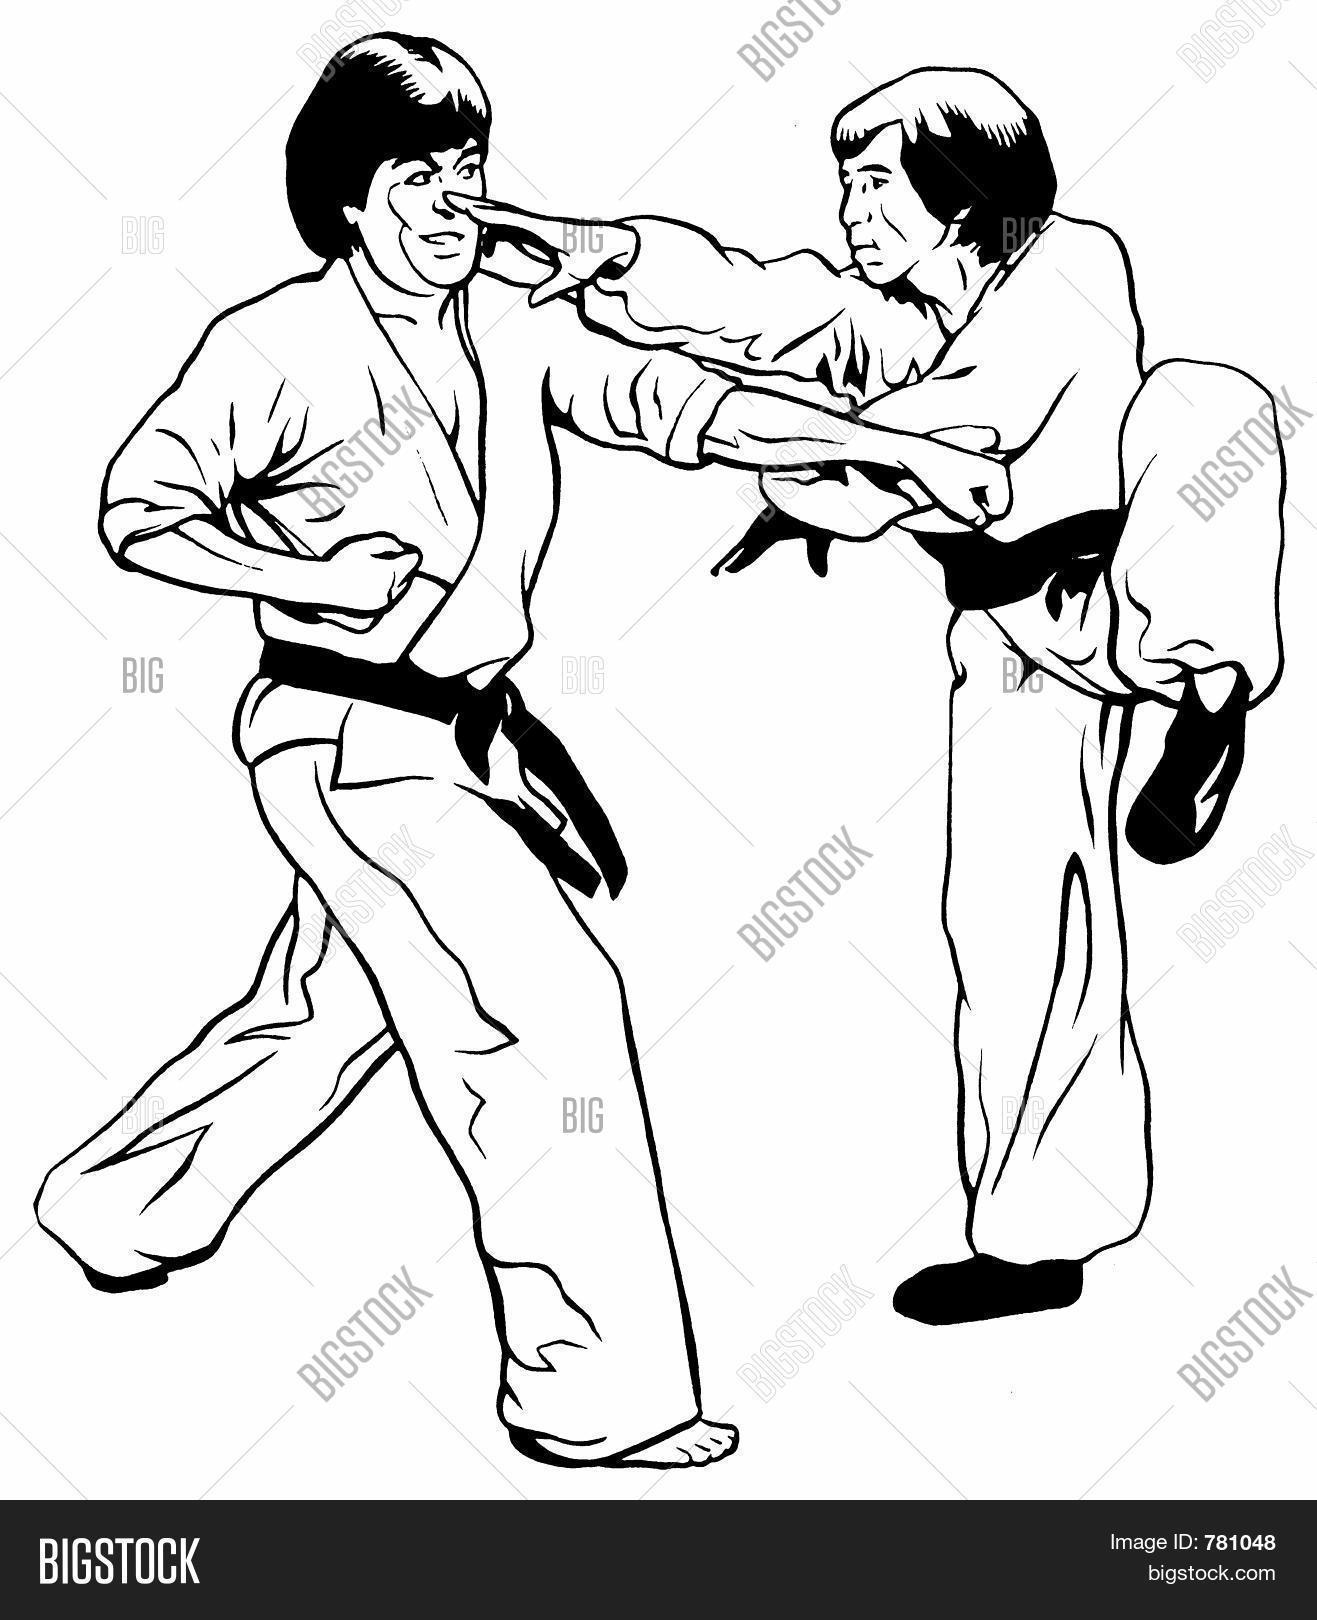 Kung Fu vs Karate/TaeKwonDo Stock Photo & Stock Images | Bigstock